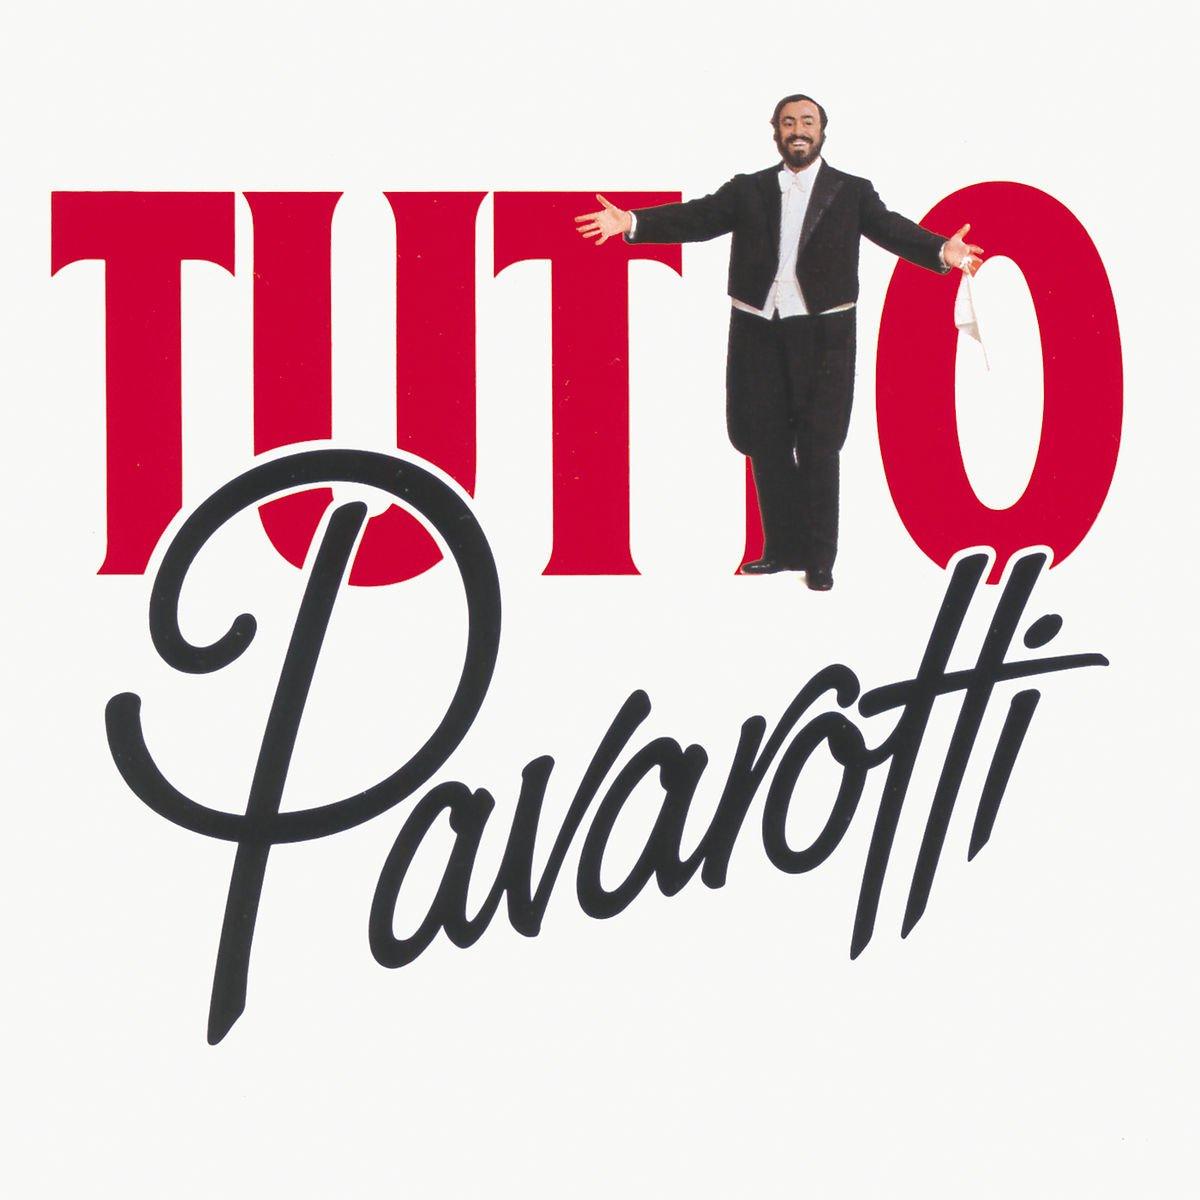 Pavarotti Cds